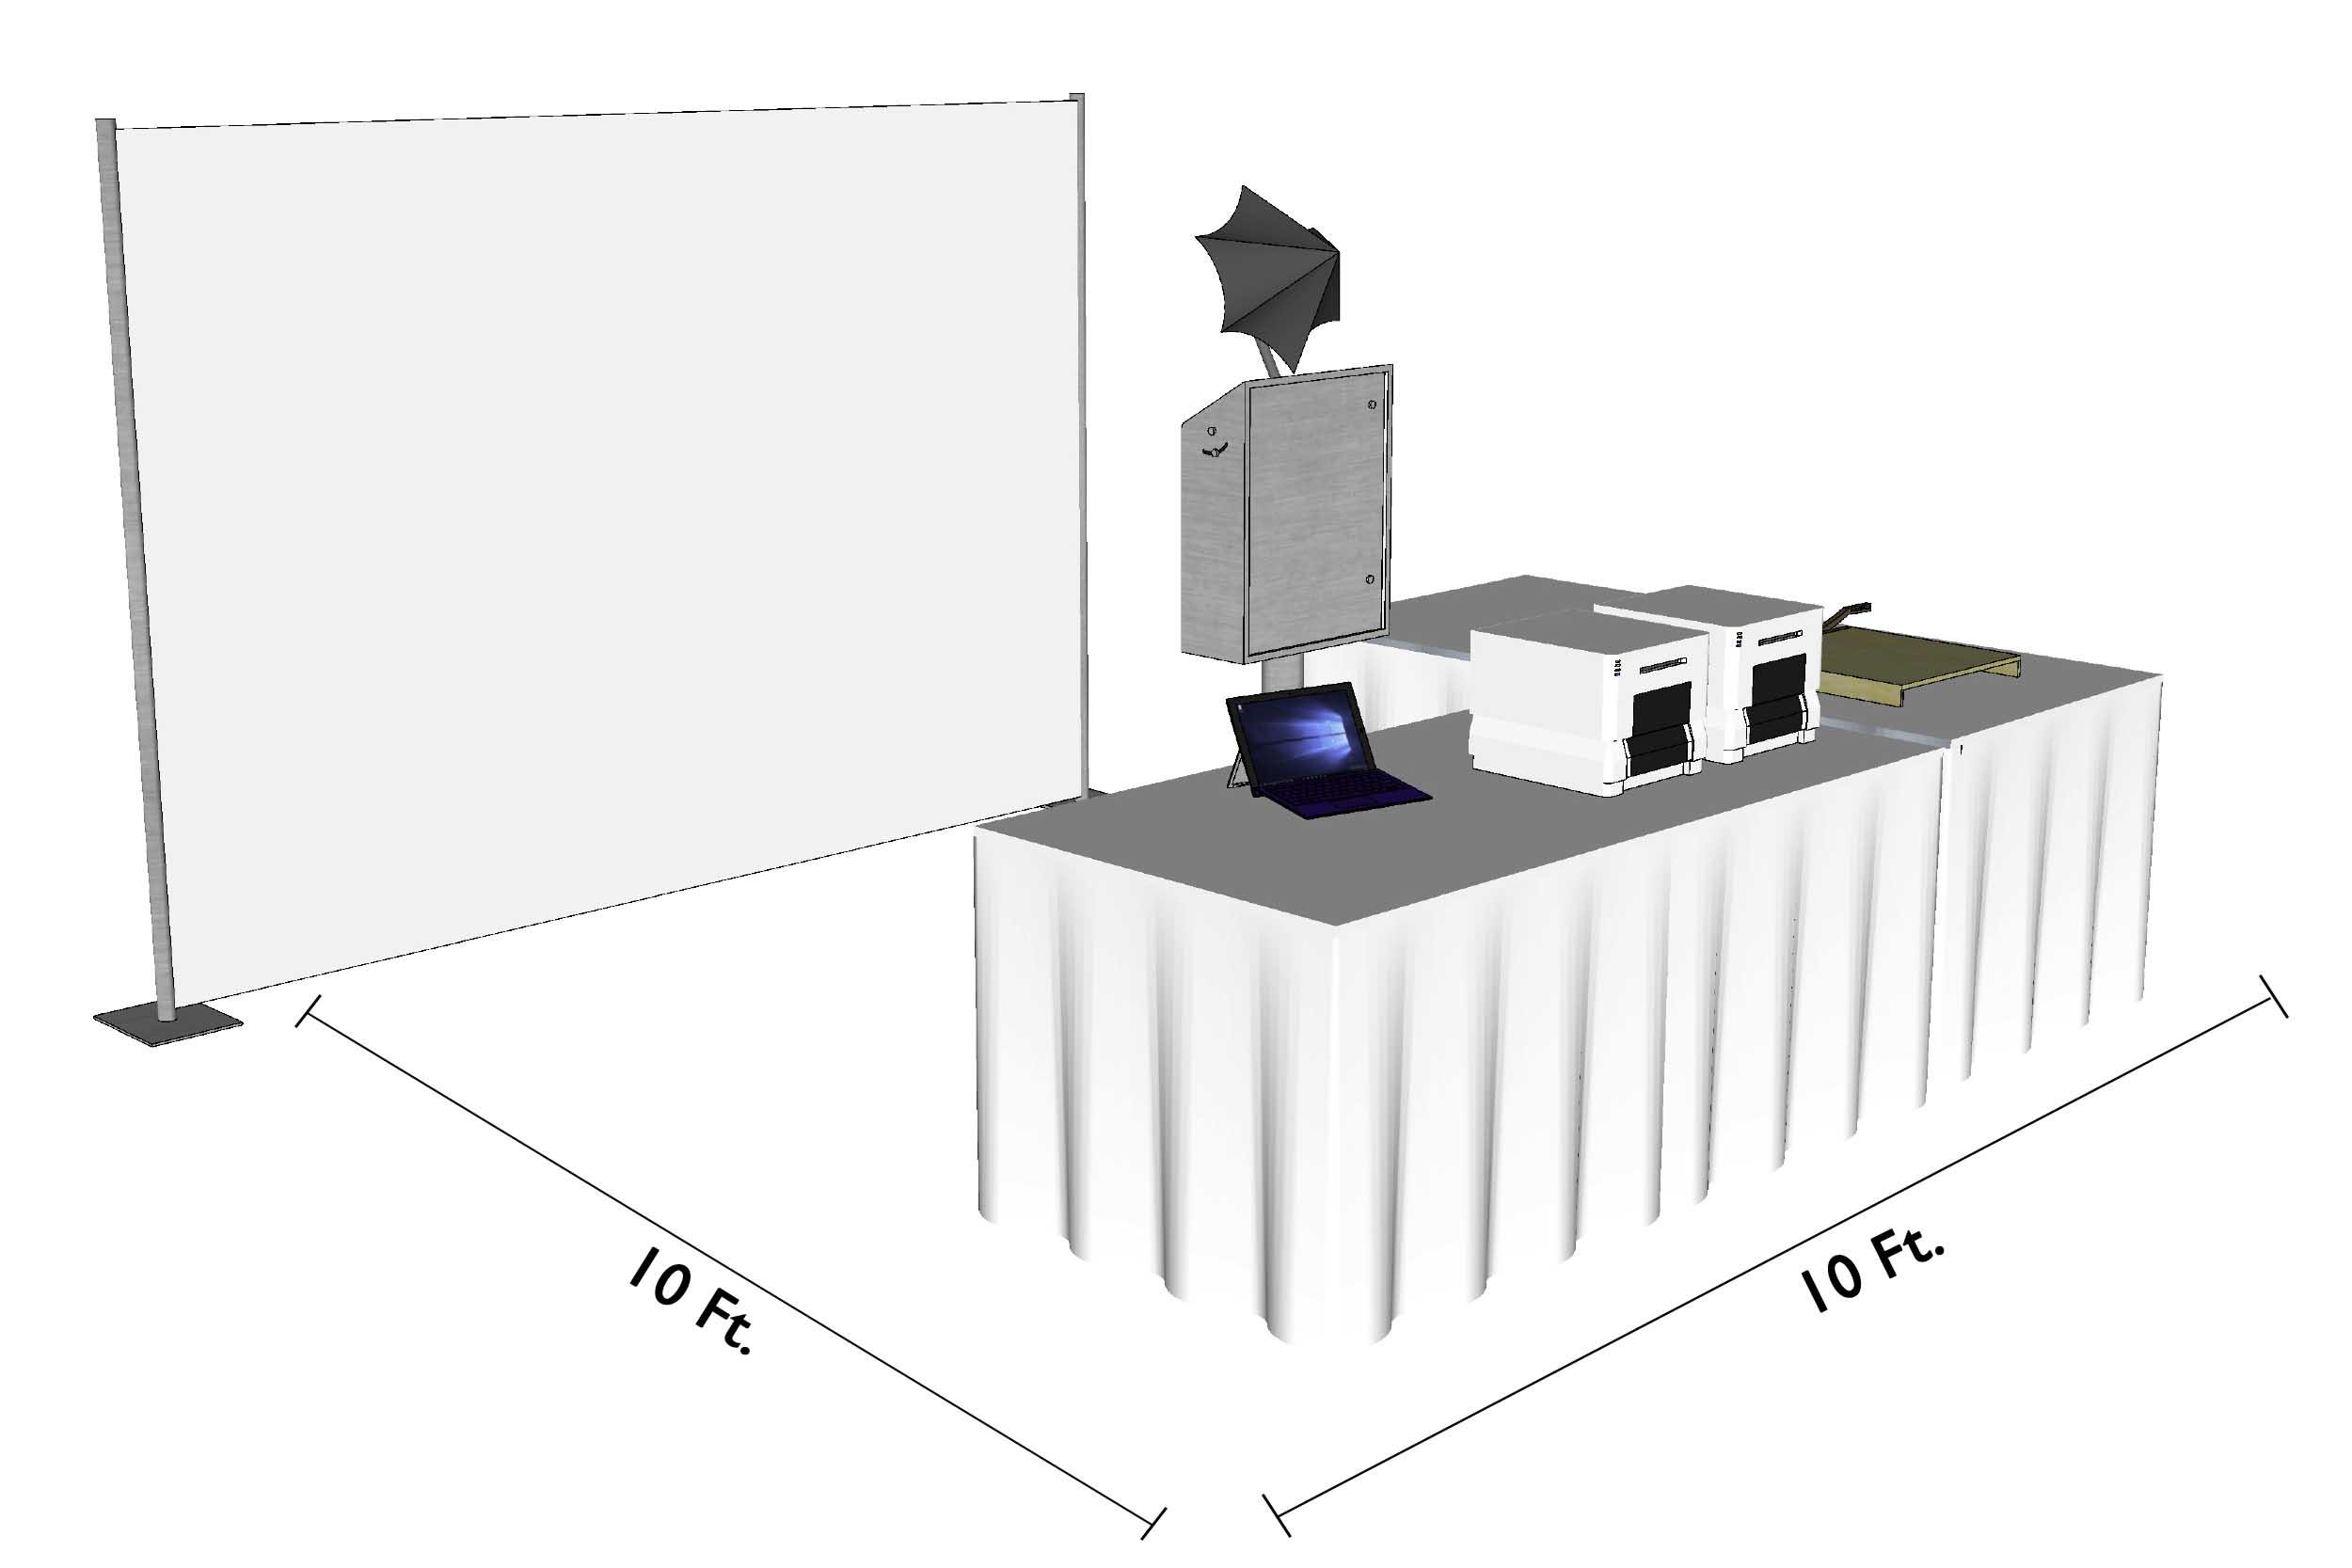 flipbookdimensions.jpg